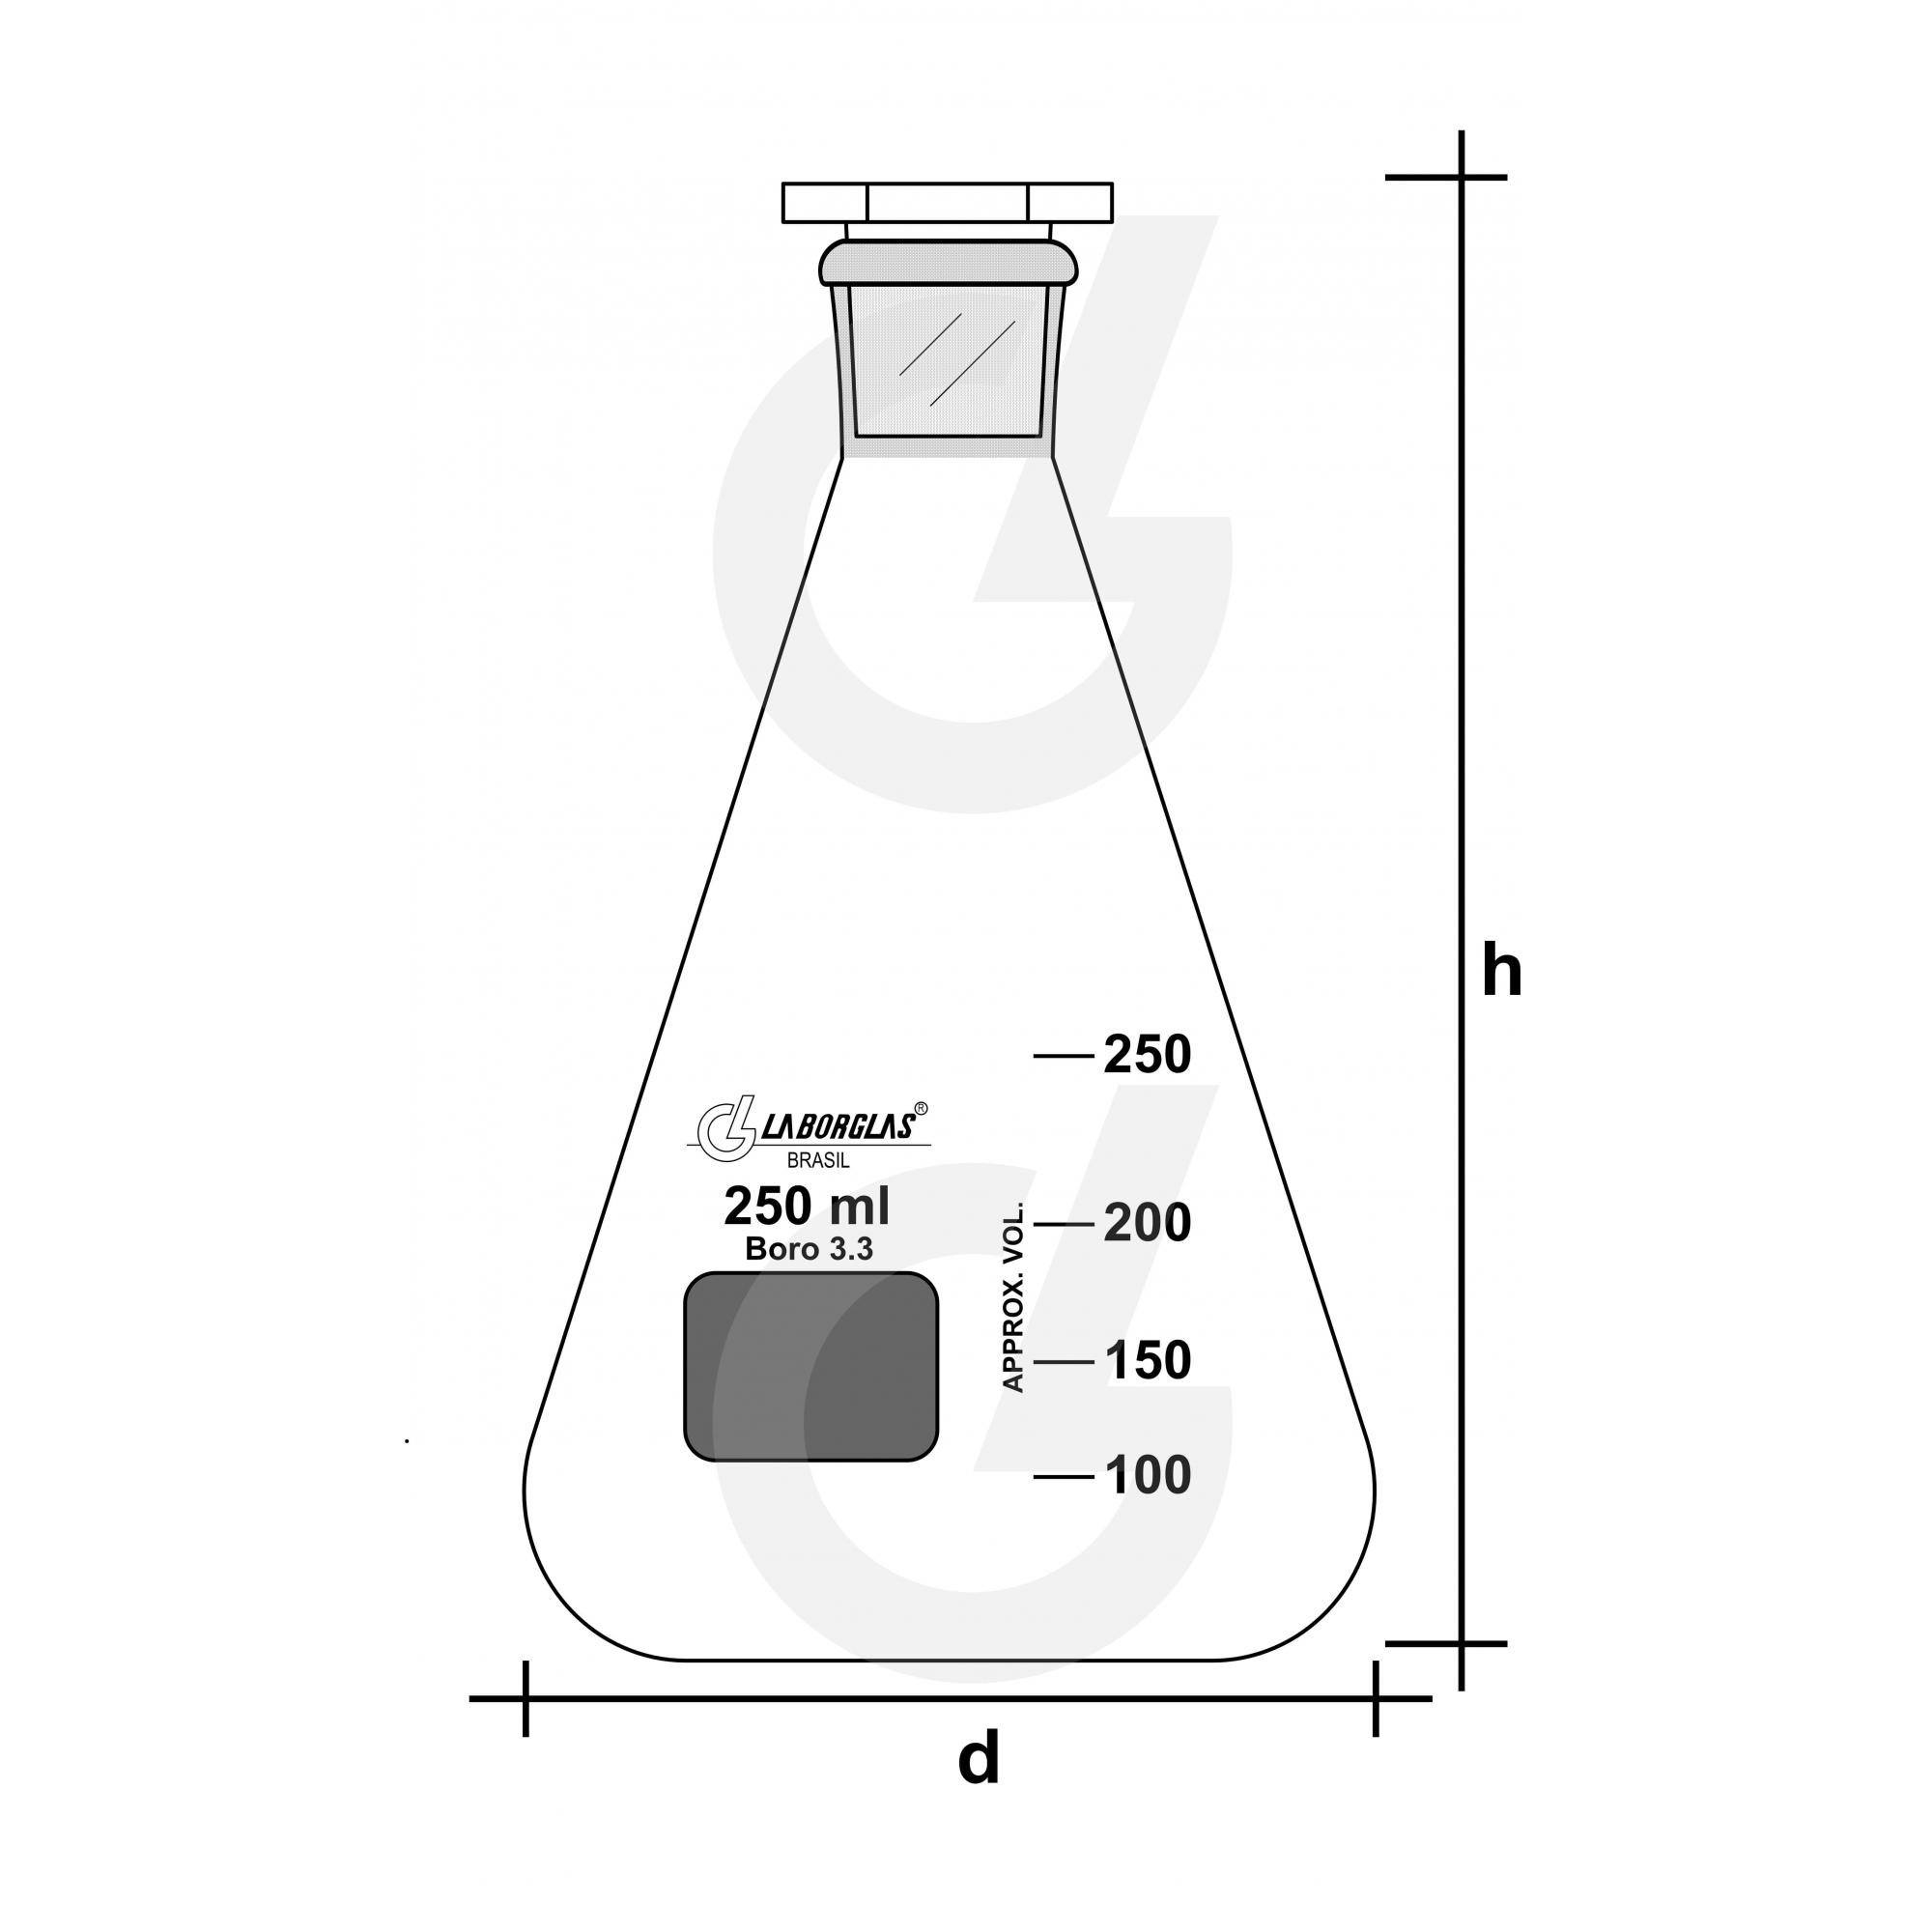 FRASCO ERLENMEYER C/ ROLHA VIDRO 500 ML - Laborglas - Cód. 91216443